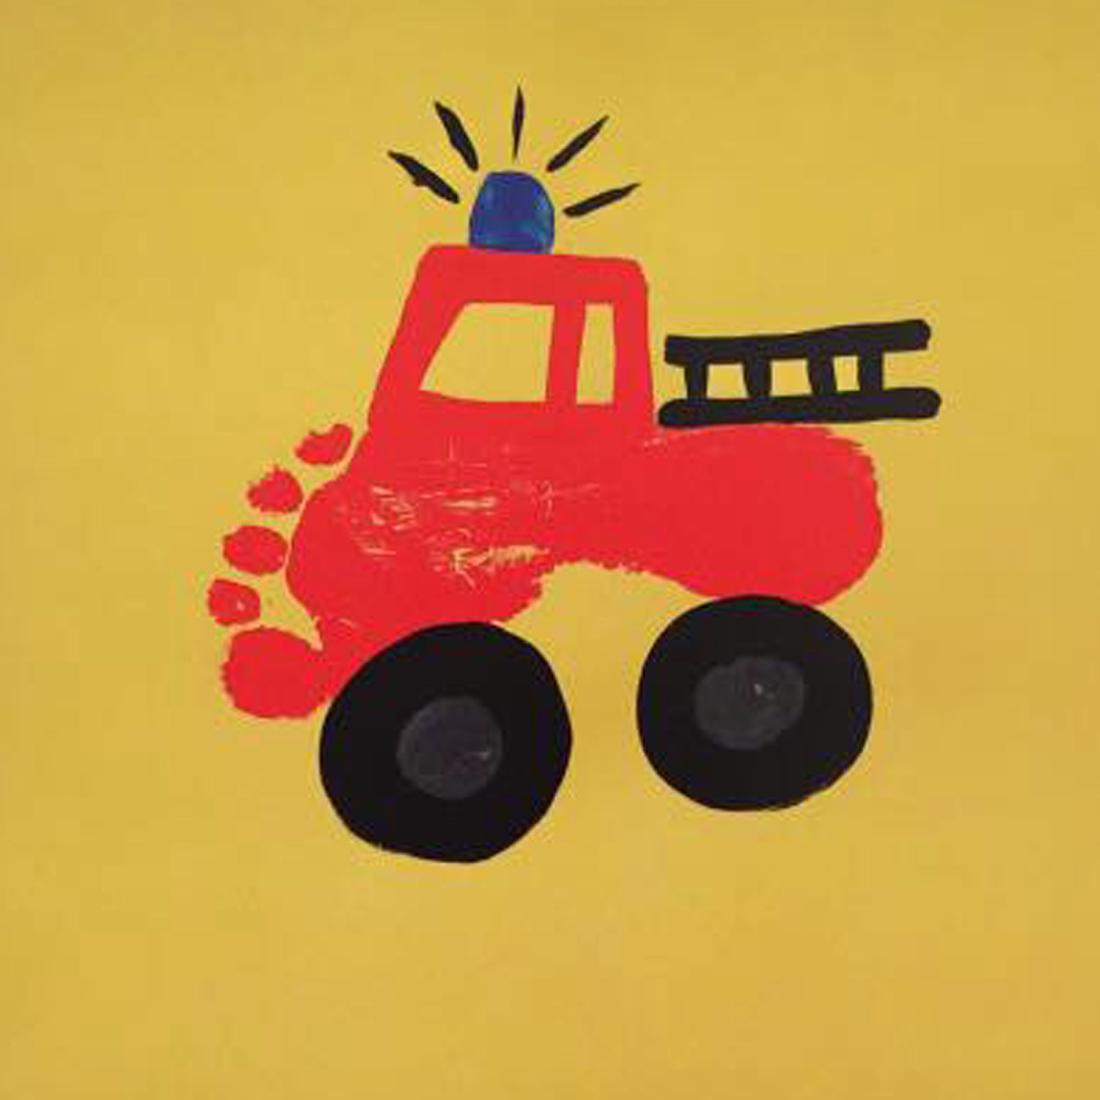 firetruck foot painting